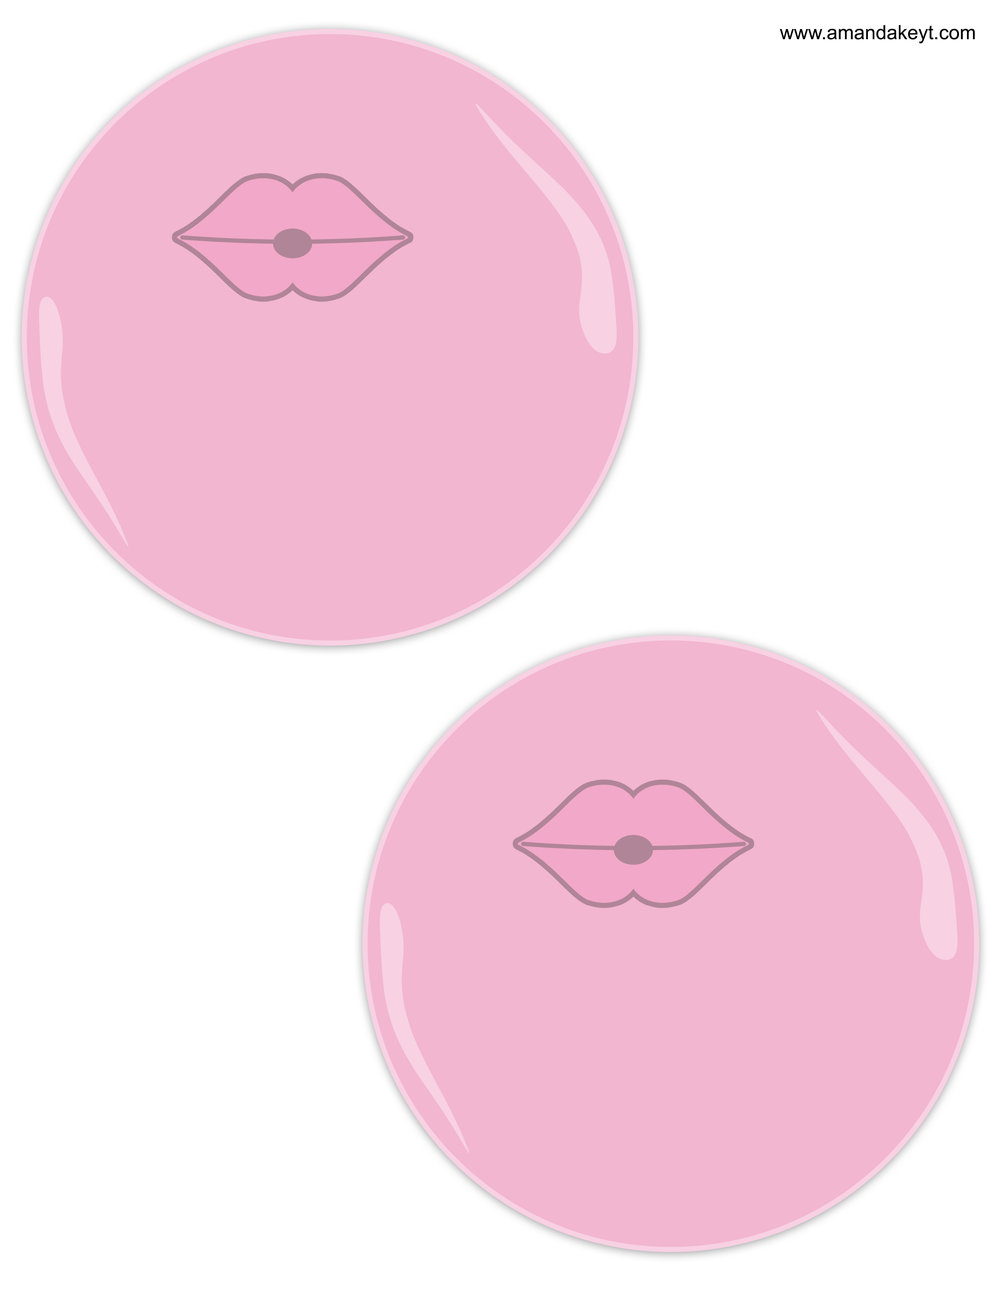 BubbleGum copy.jpg